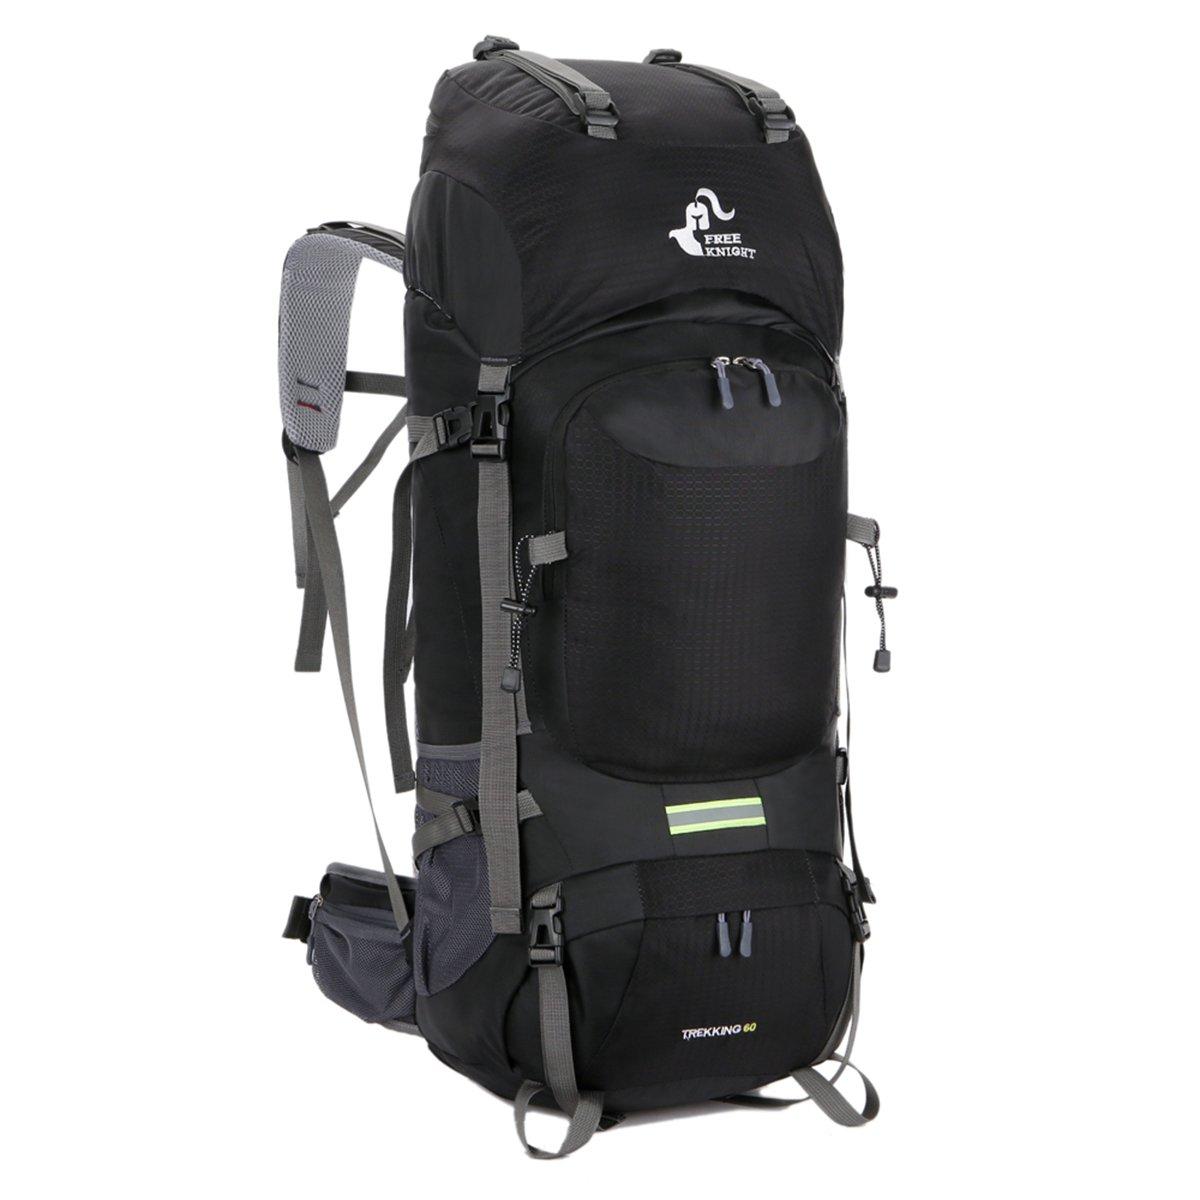 Amazon Best Sellers: Best Internal Frame Hiking Backpacks